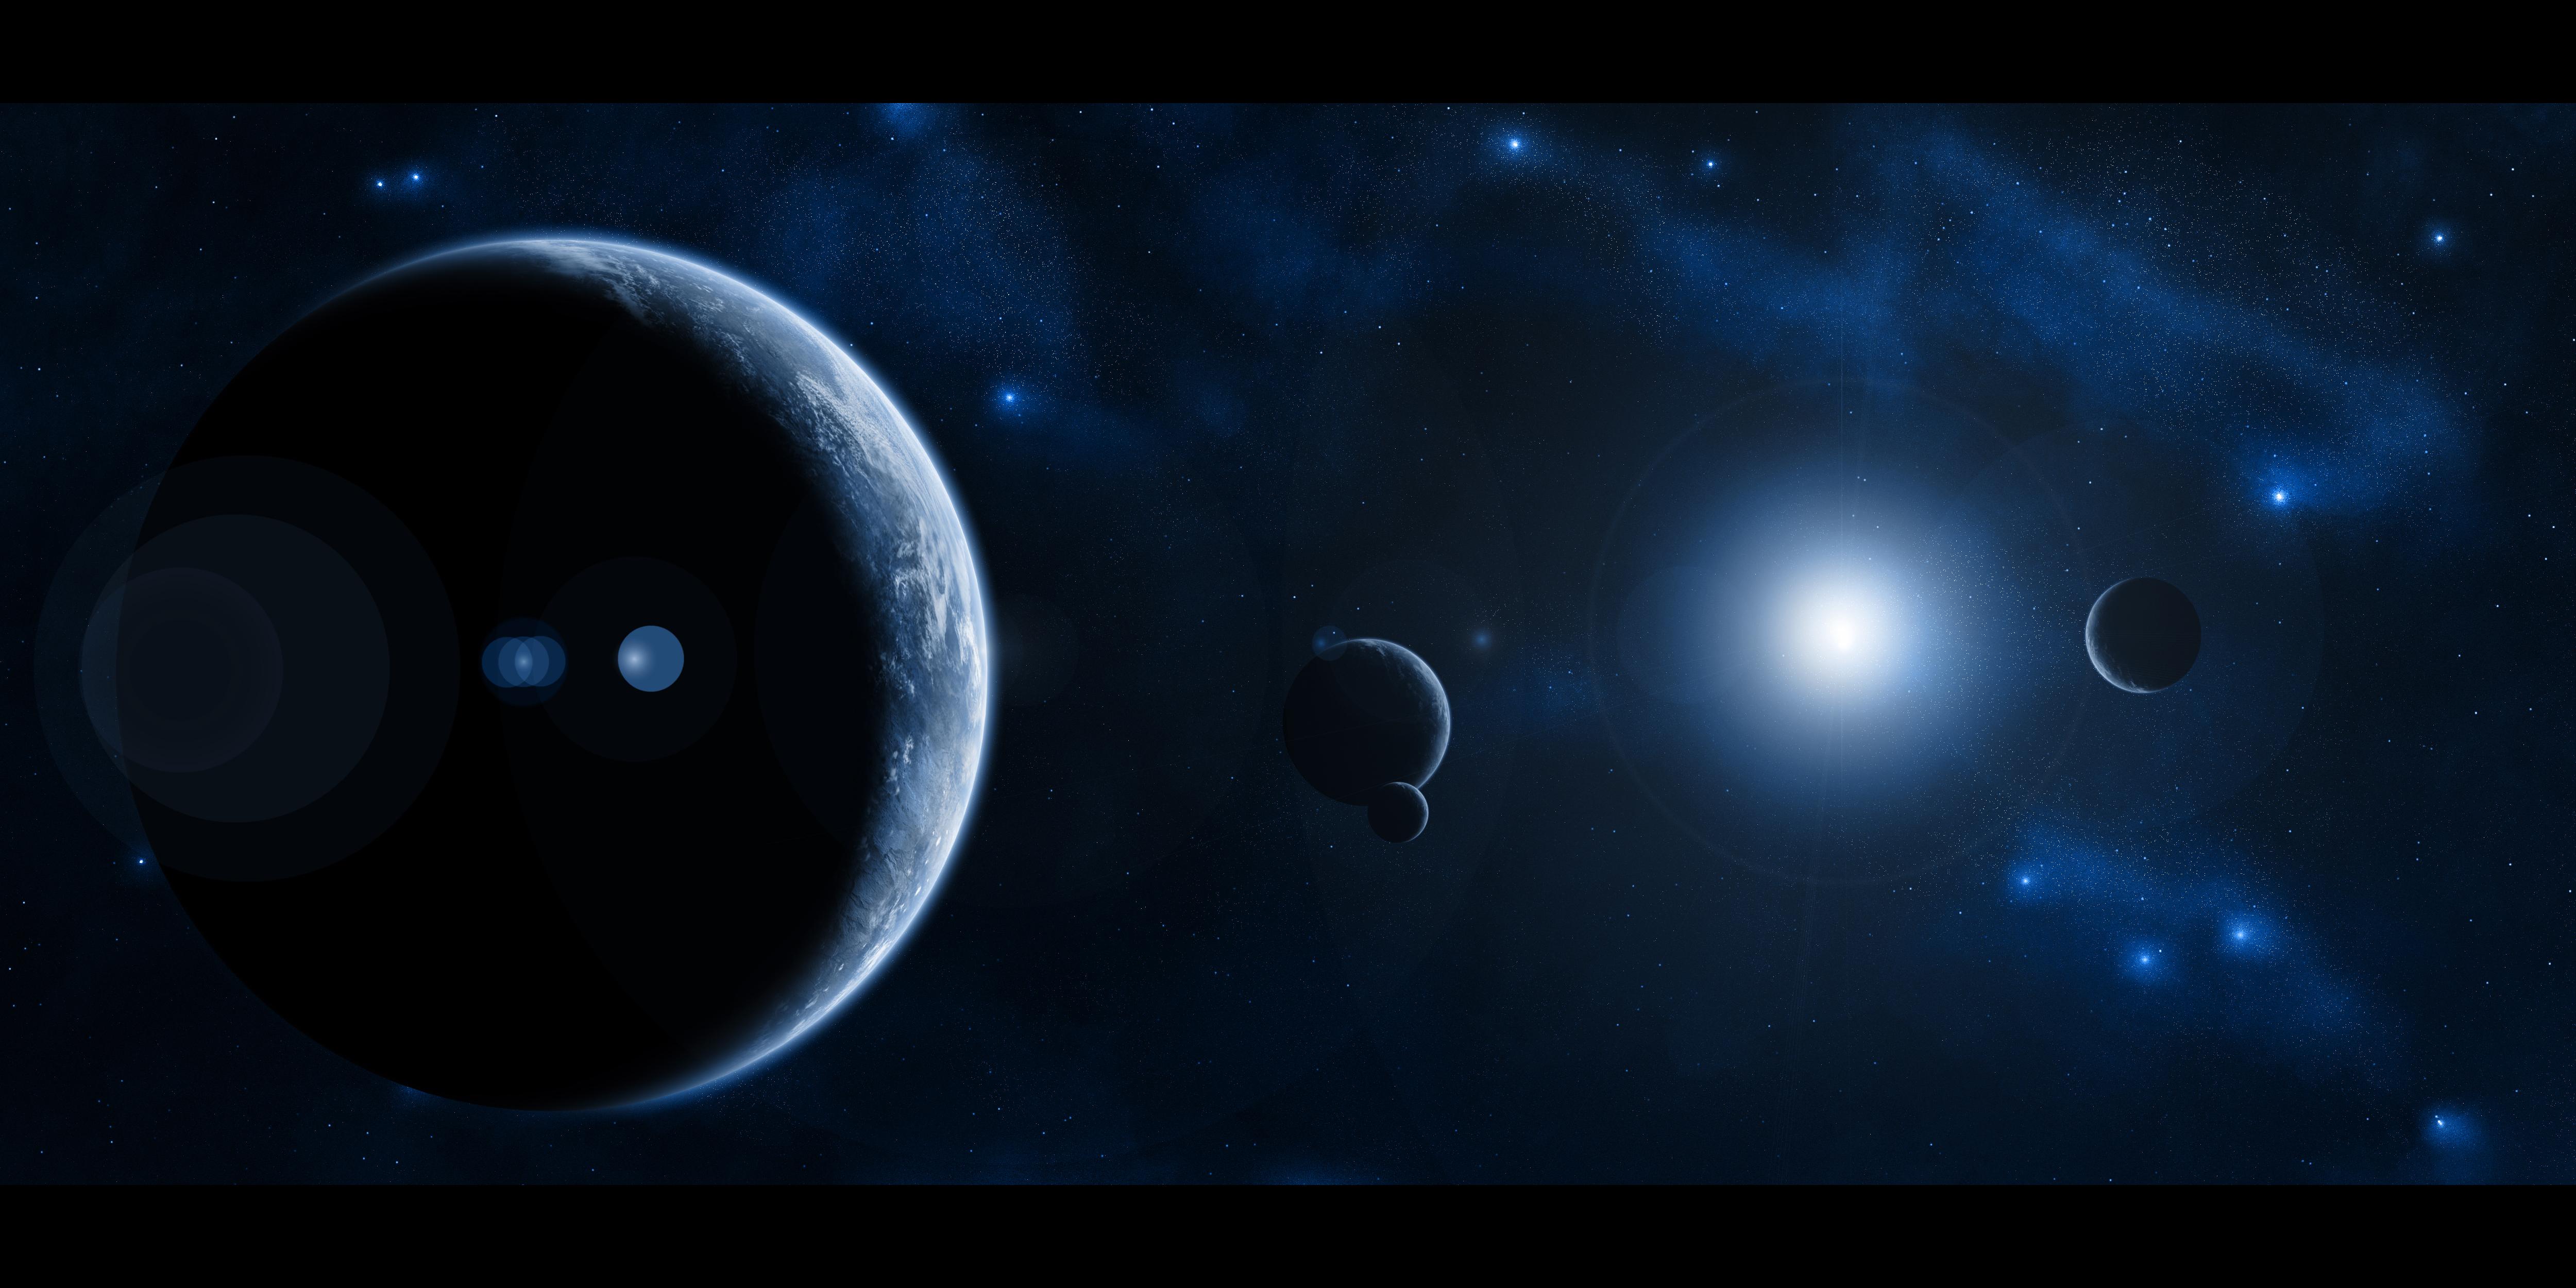 Calm Space by Mvisl